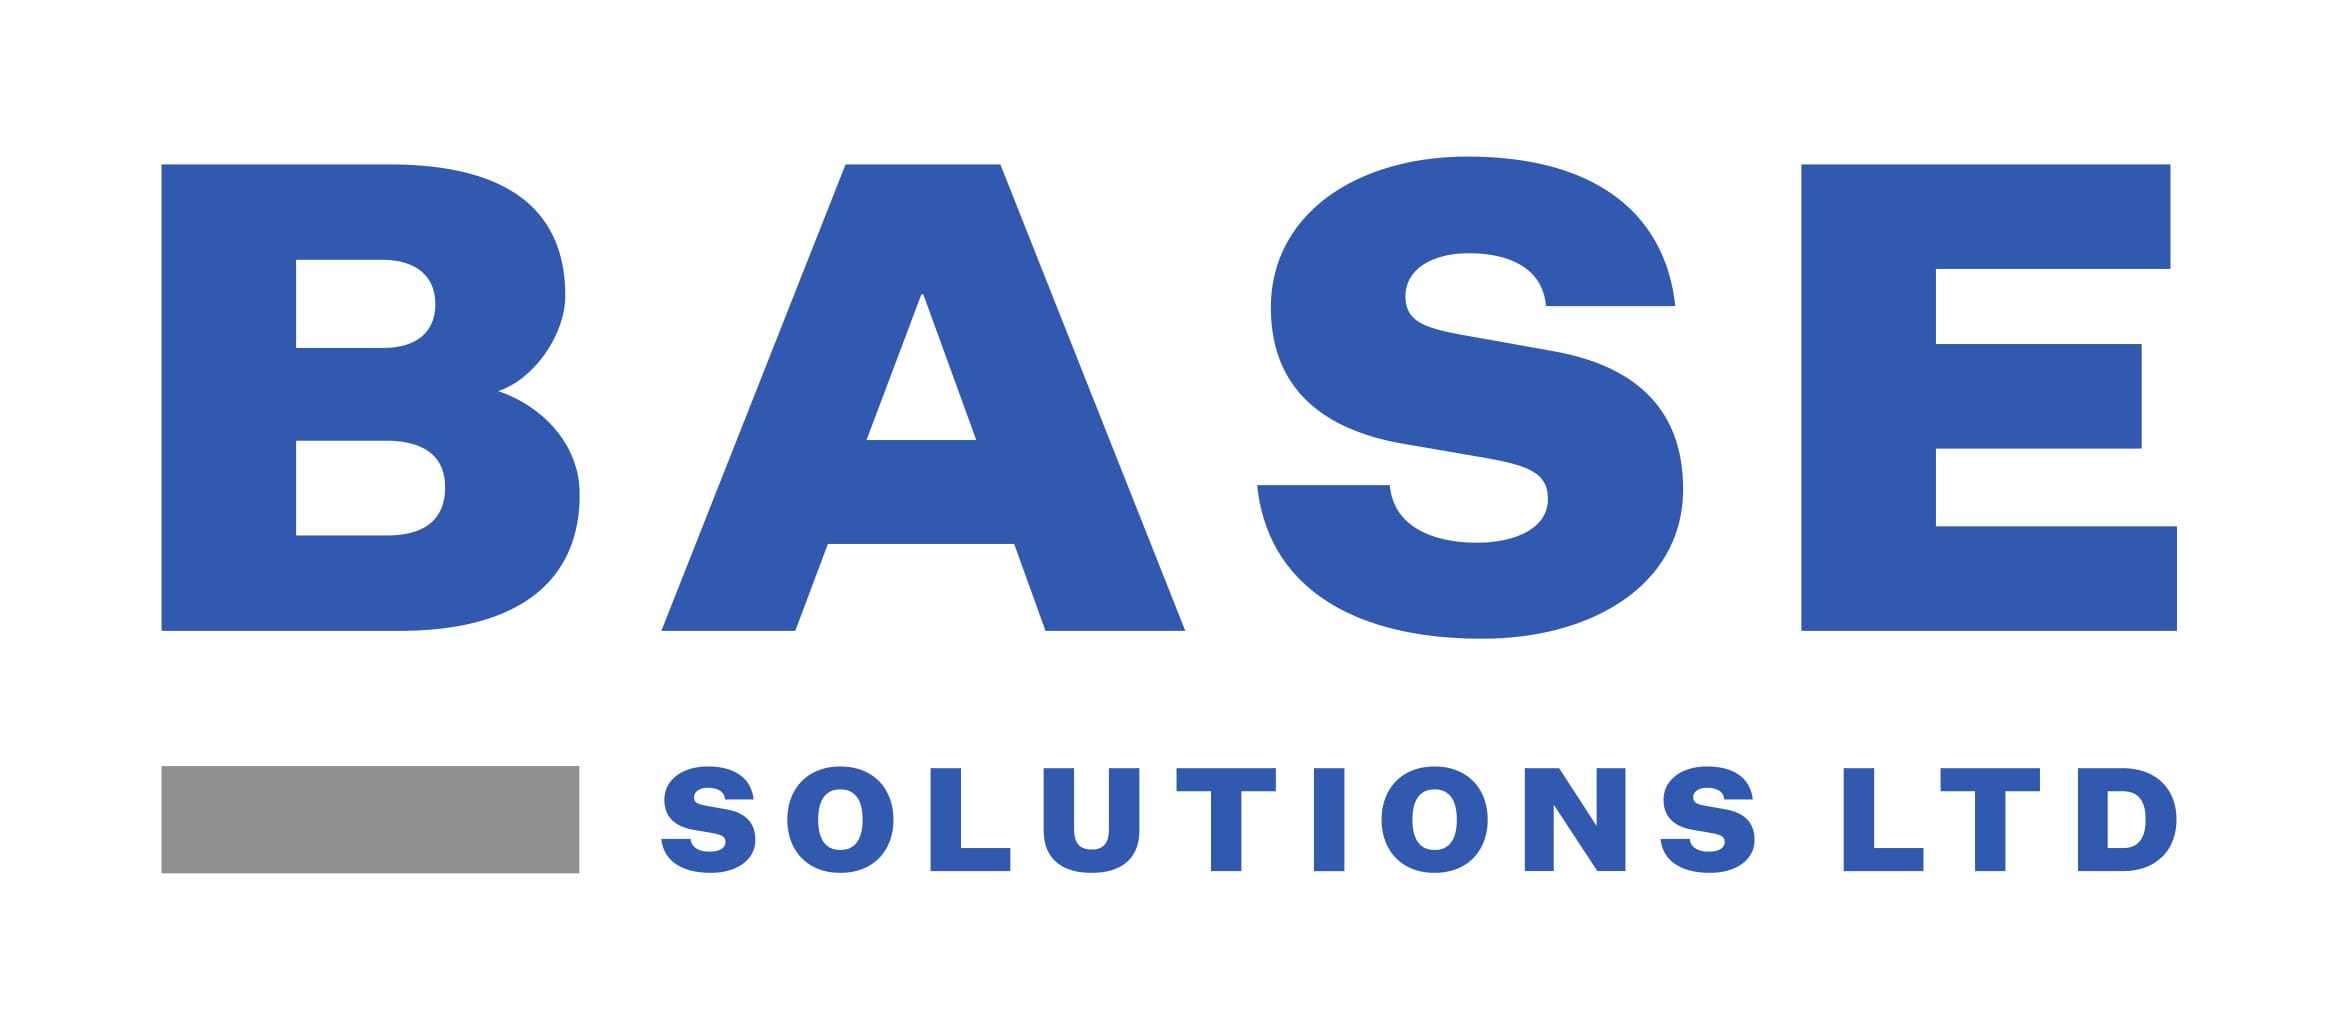 BASE Solutions Ltd logo main 1